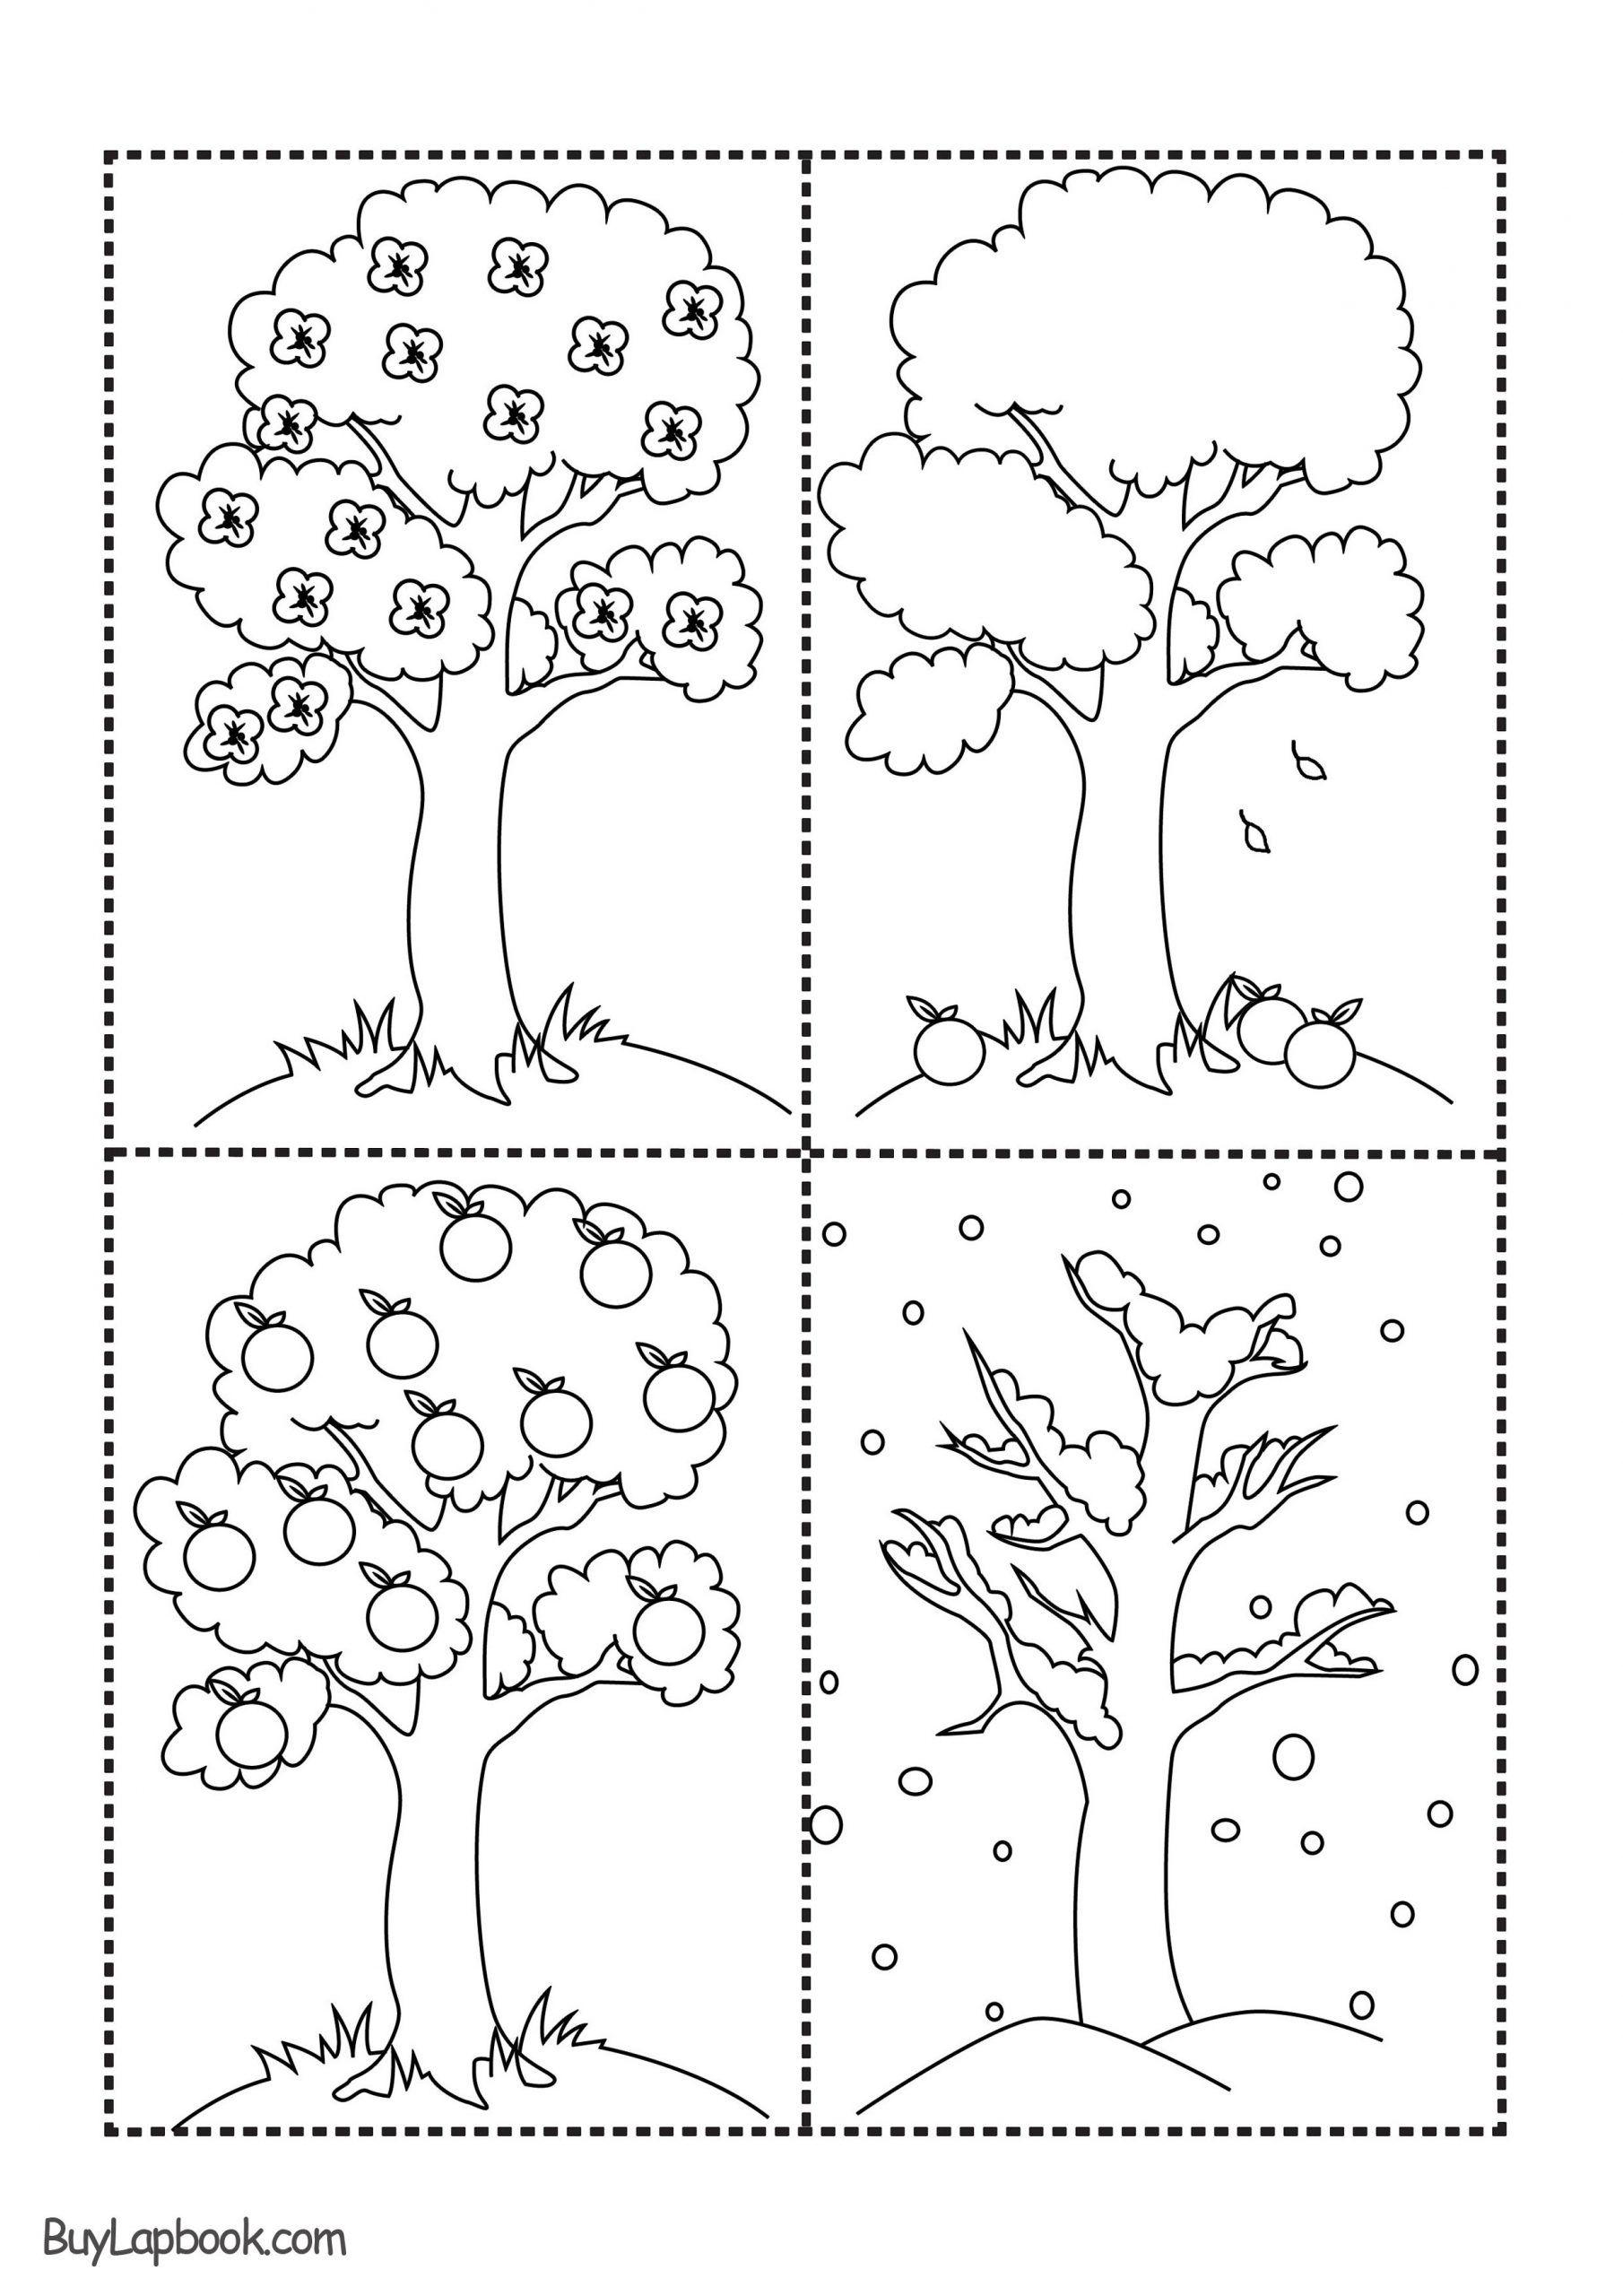 Tree Worksheets For Kindergarten